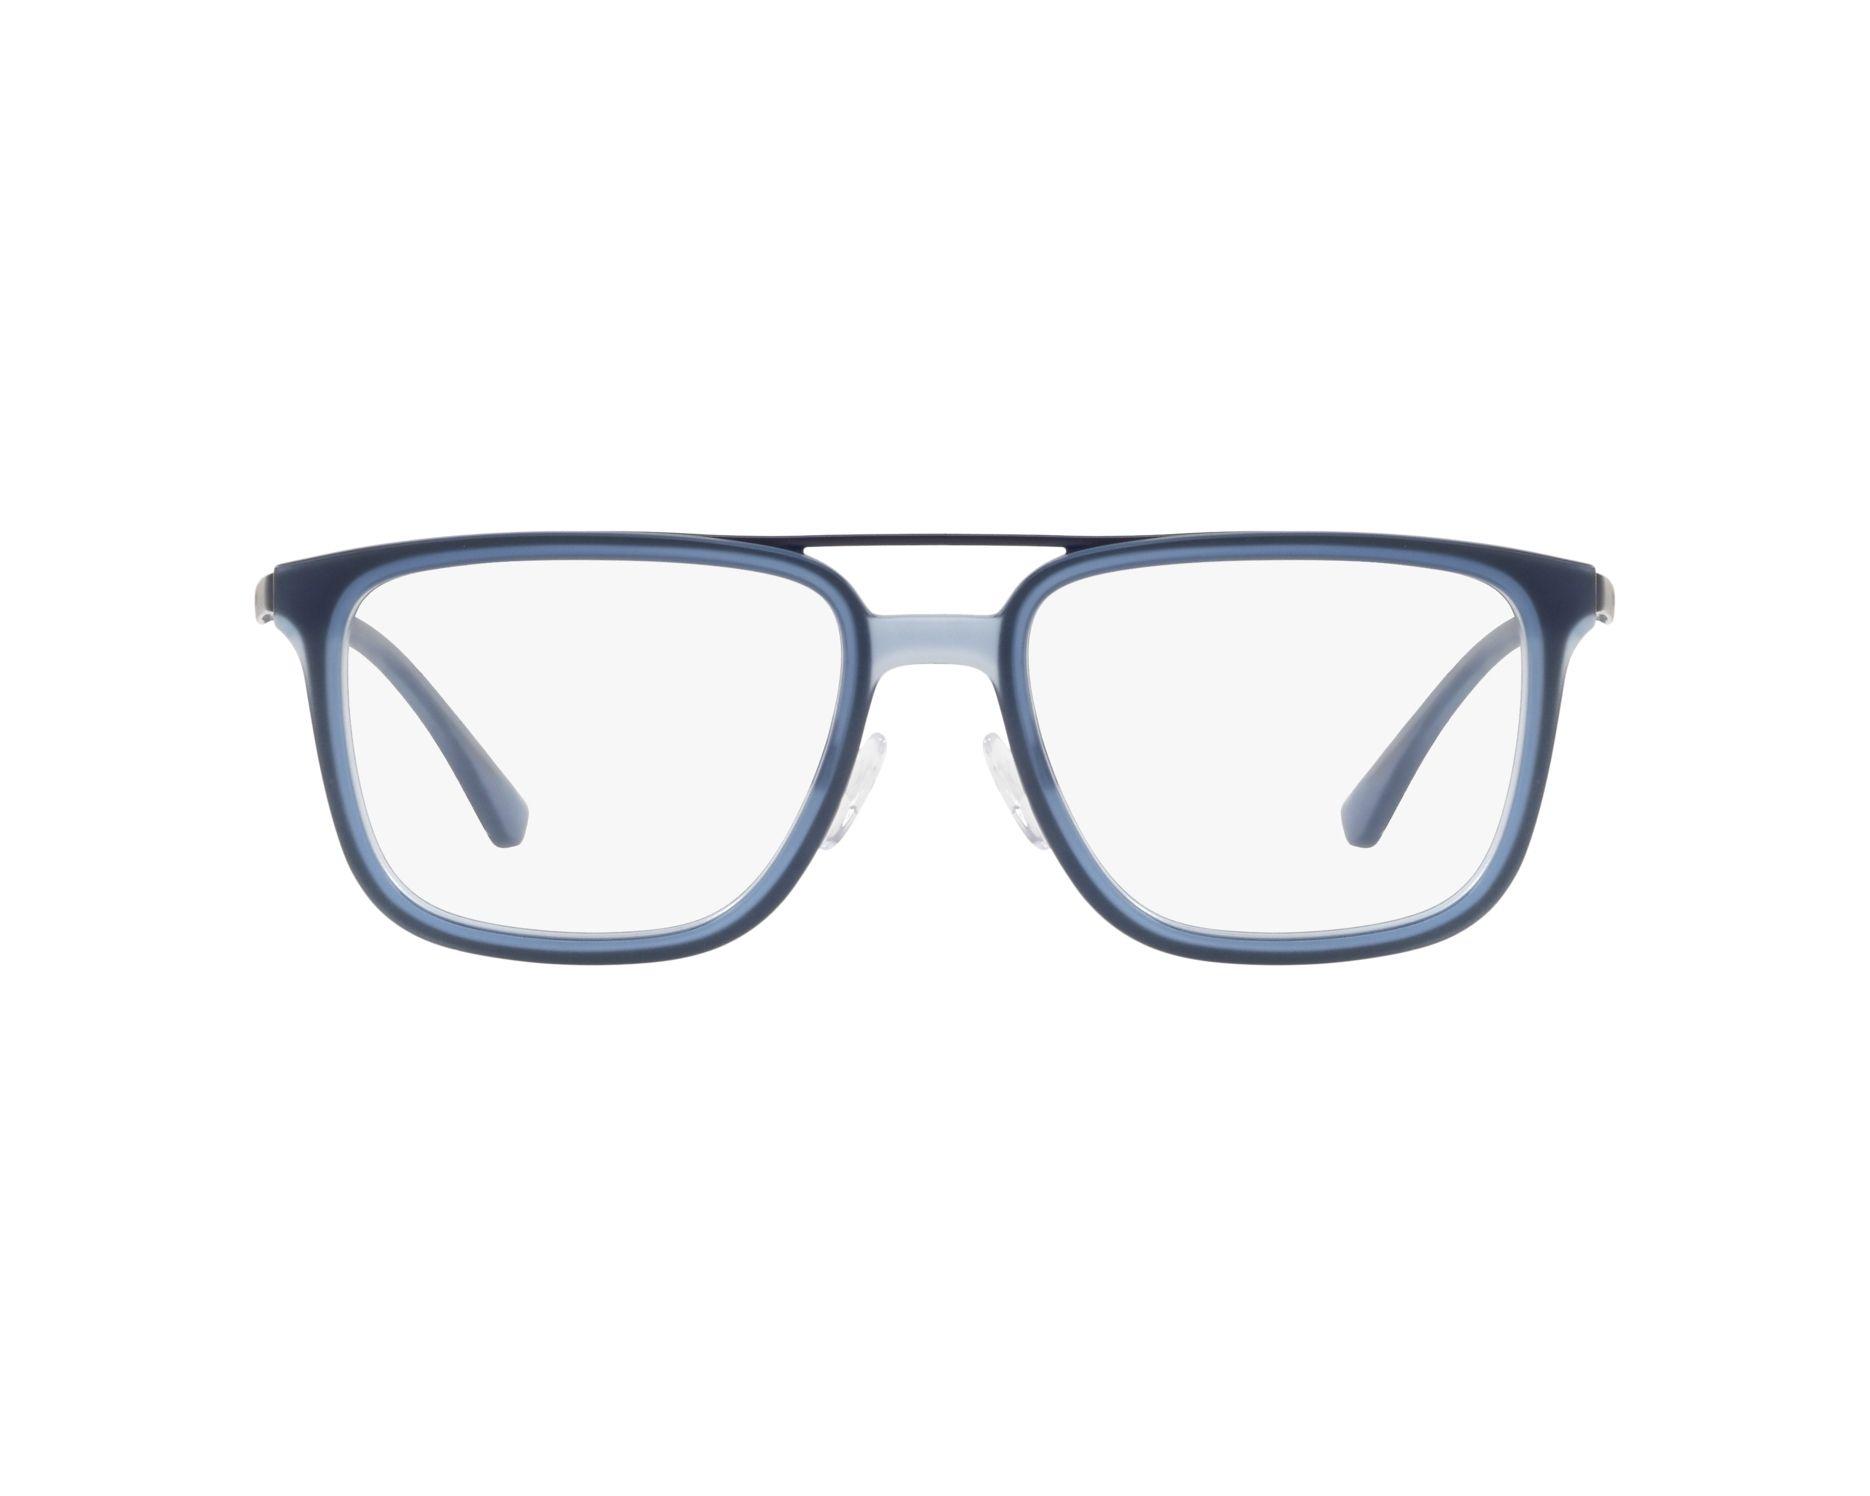 Emporio Armani Eyeglasses EA-1073 3128 Blue - Visionet UK